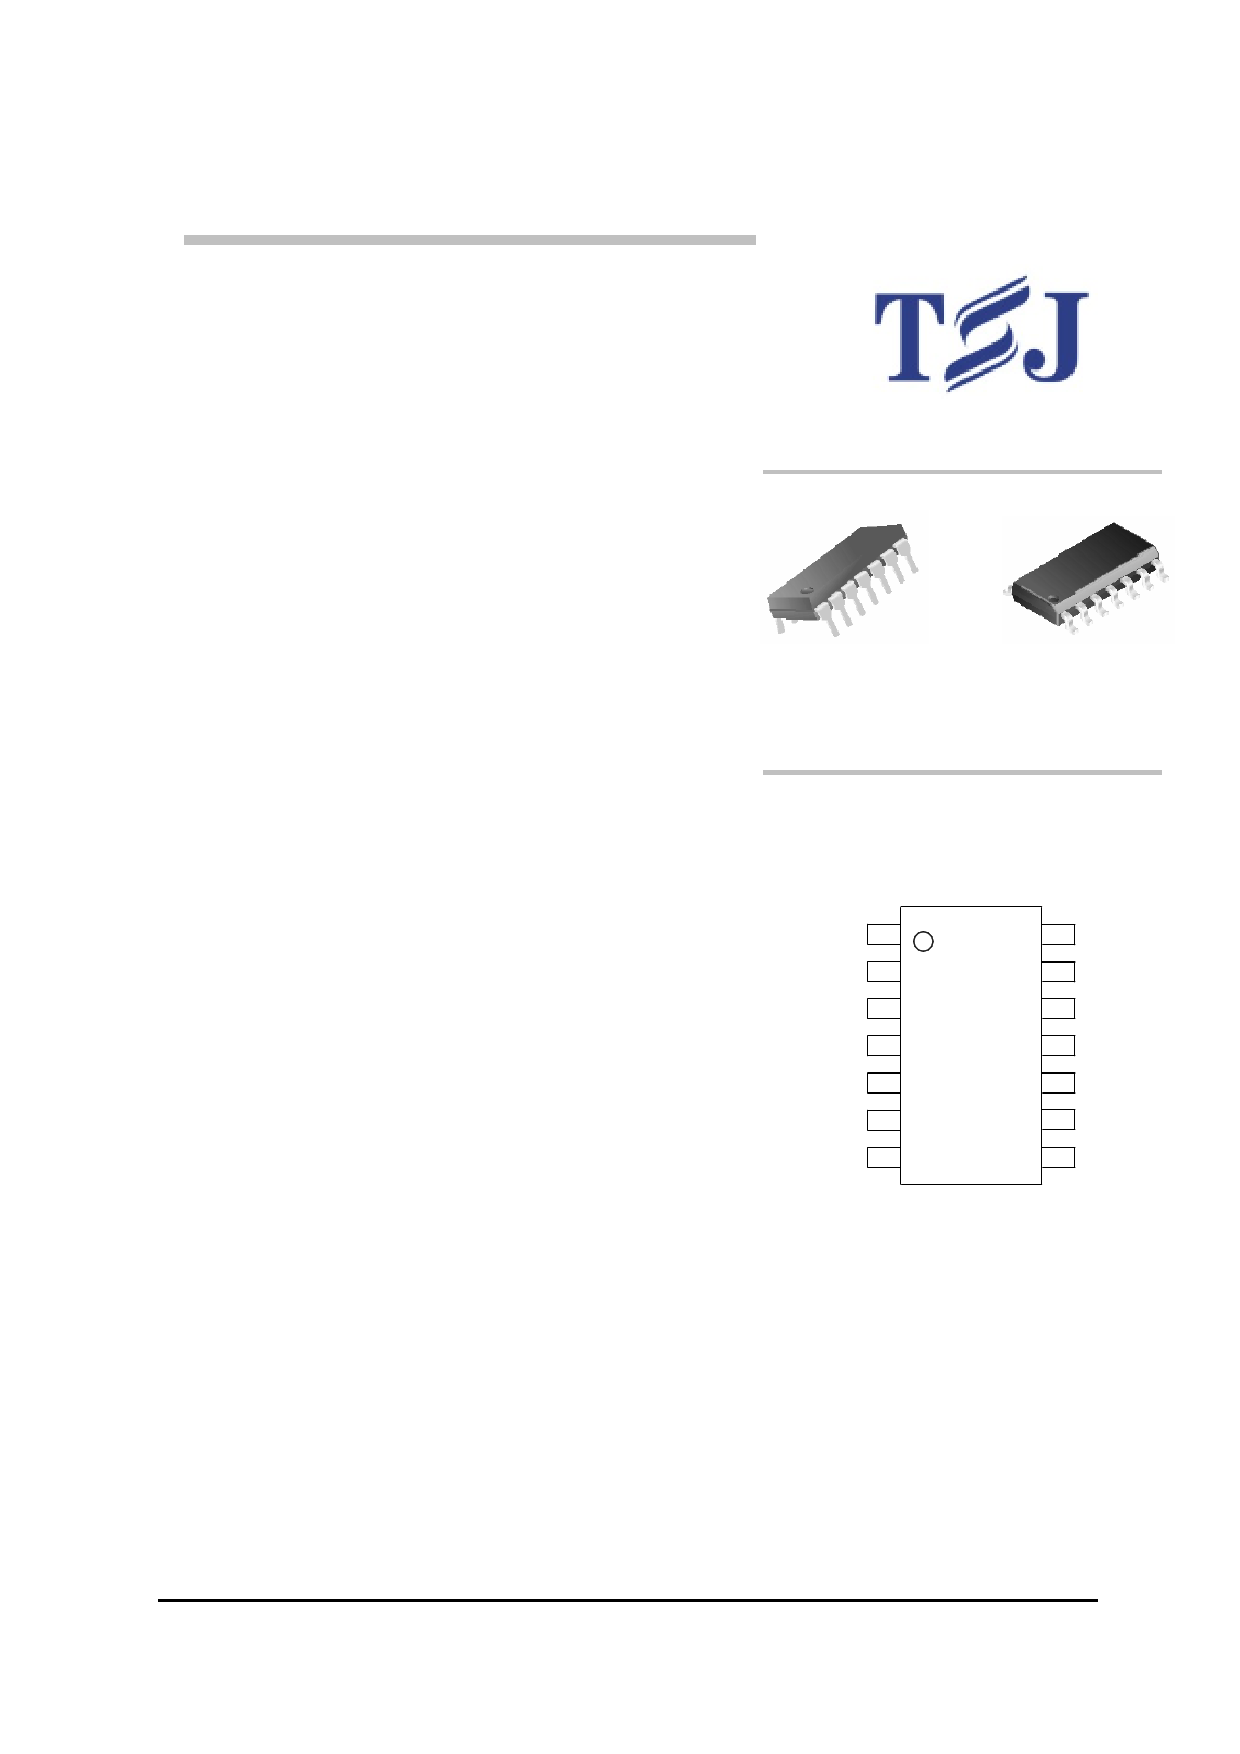 MB324 데이터시트 및 MB324 PDF